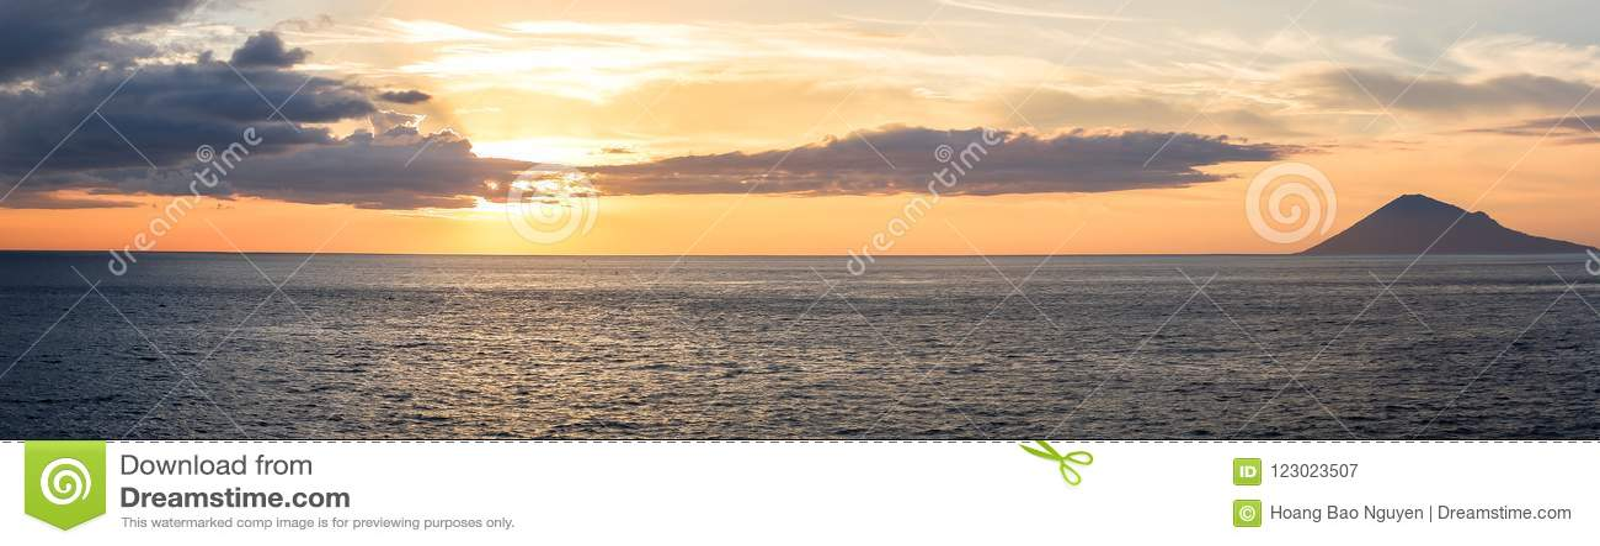 Заход солнца в городе Manado, северном Сулавеси